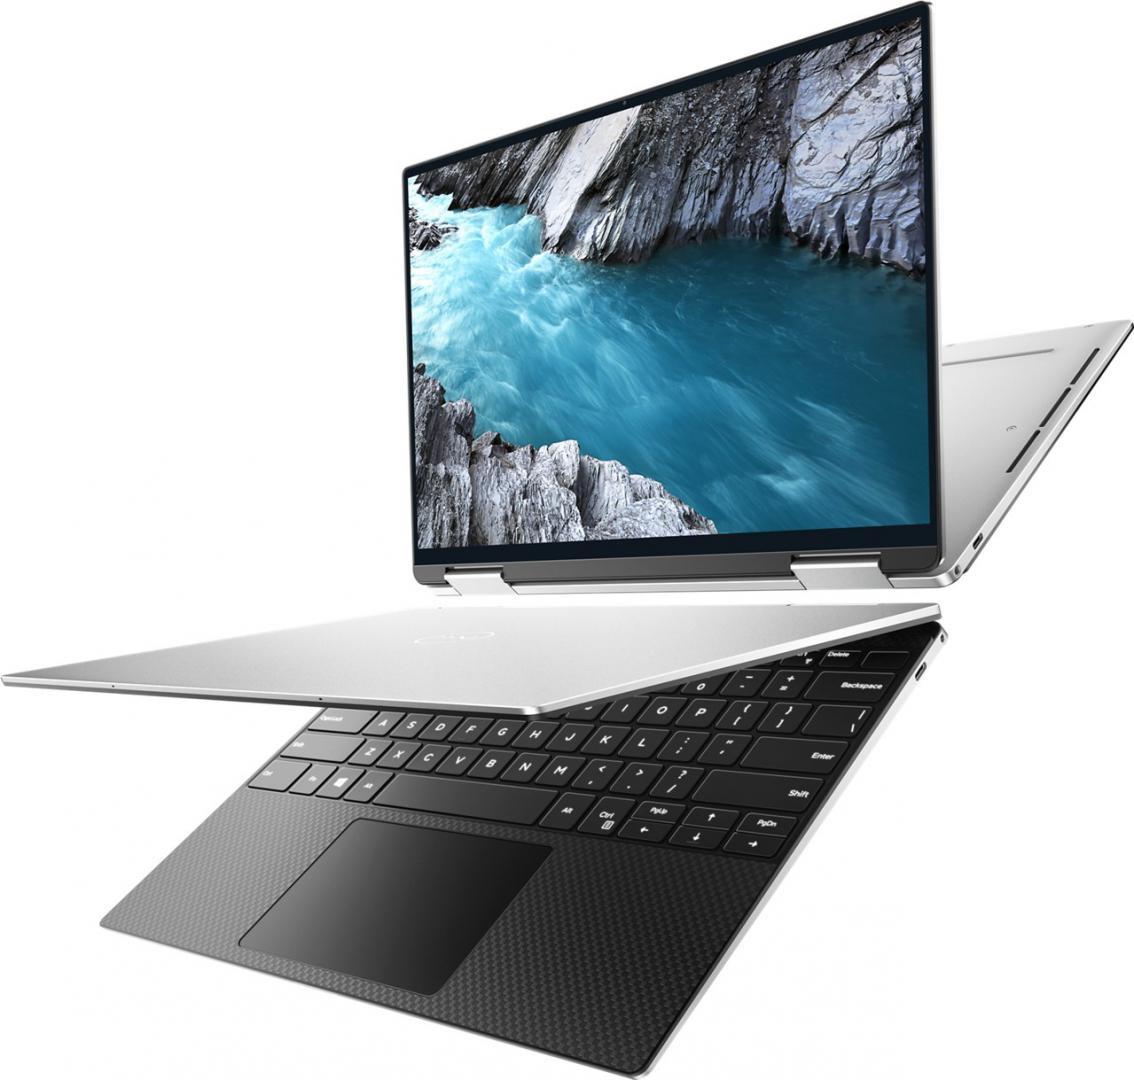 "Ultrabook Dell XPS 13 9310 2in1, Touch, 13.4"" FHD+ (1920 x 1200), i7-1165G7, 16GB, 512GB SSD, Intel Iris Xe Graphics, W10 Pro - imaginea 16"